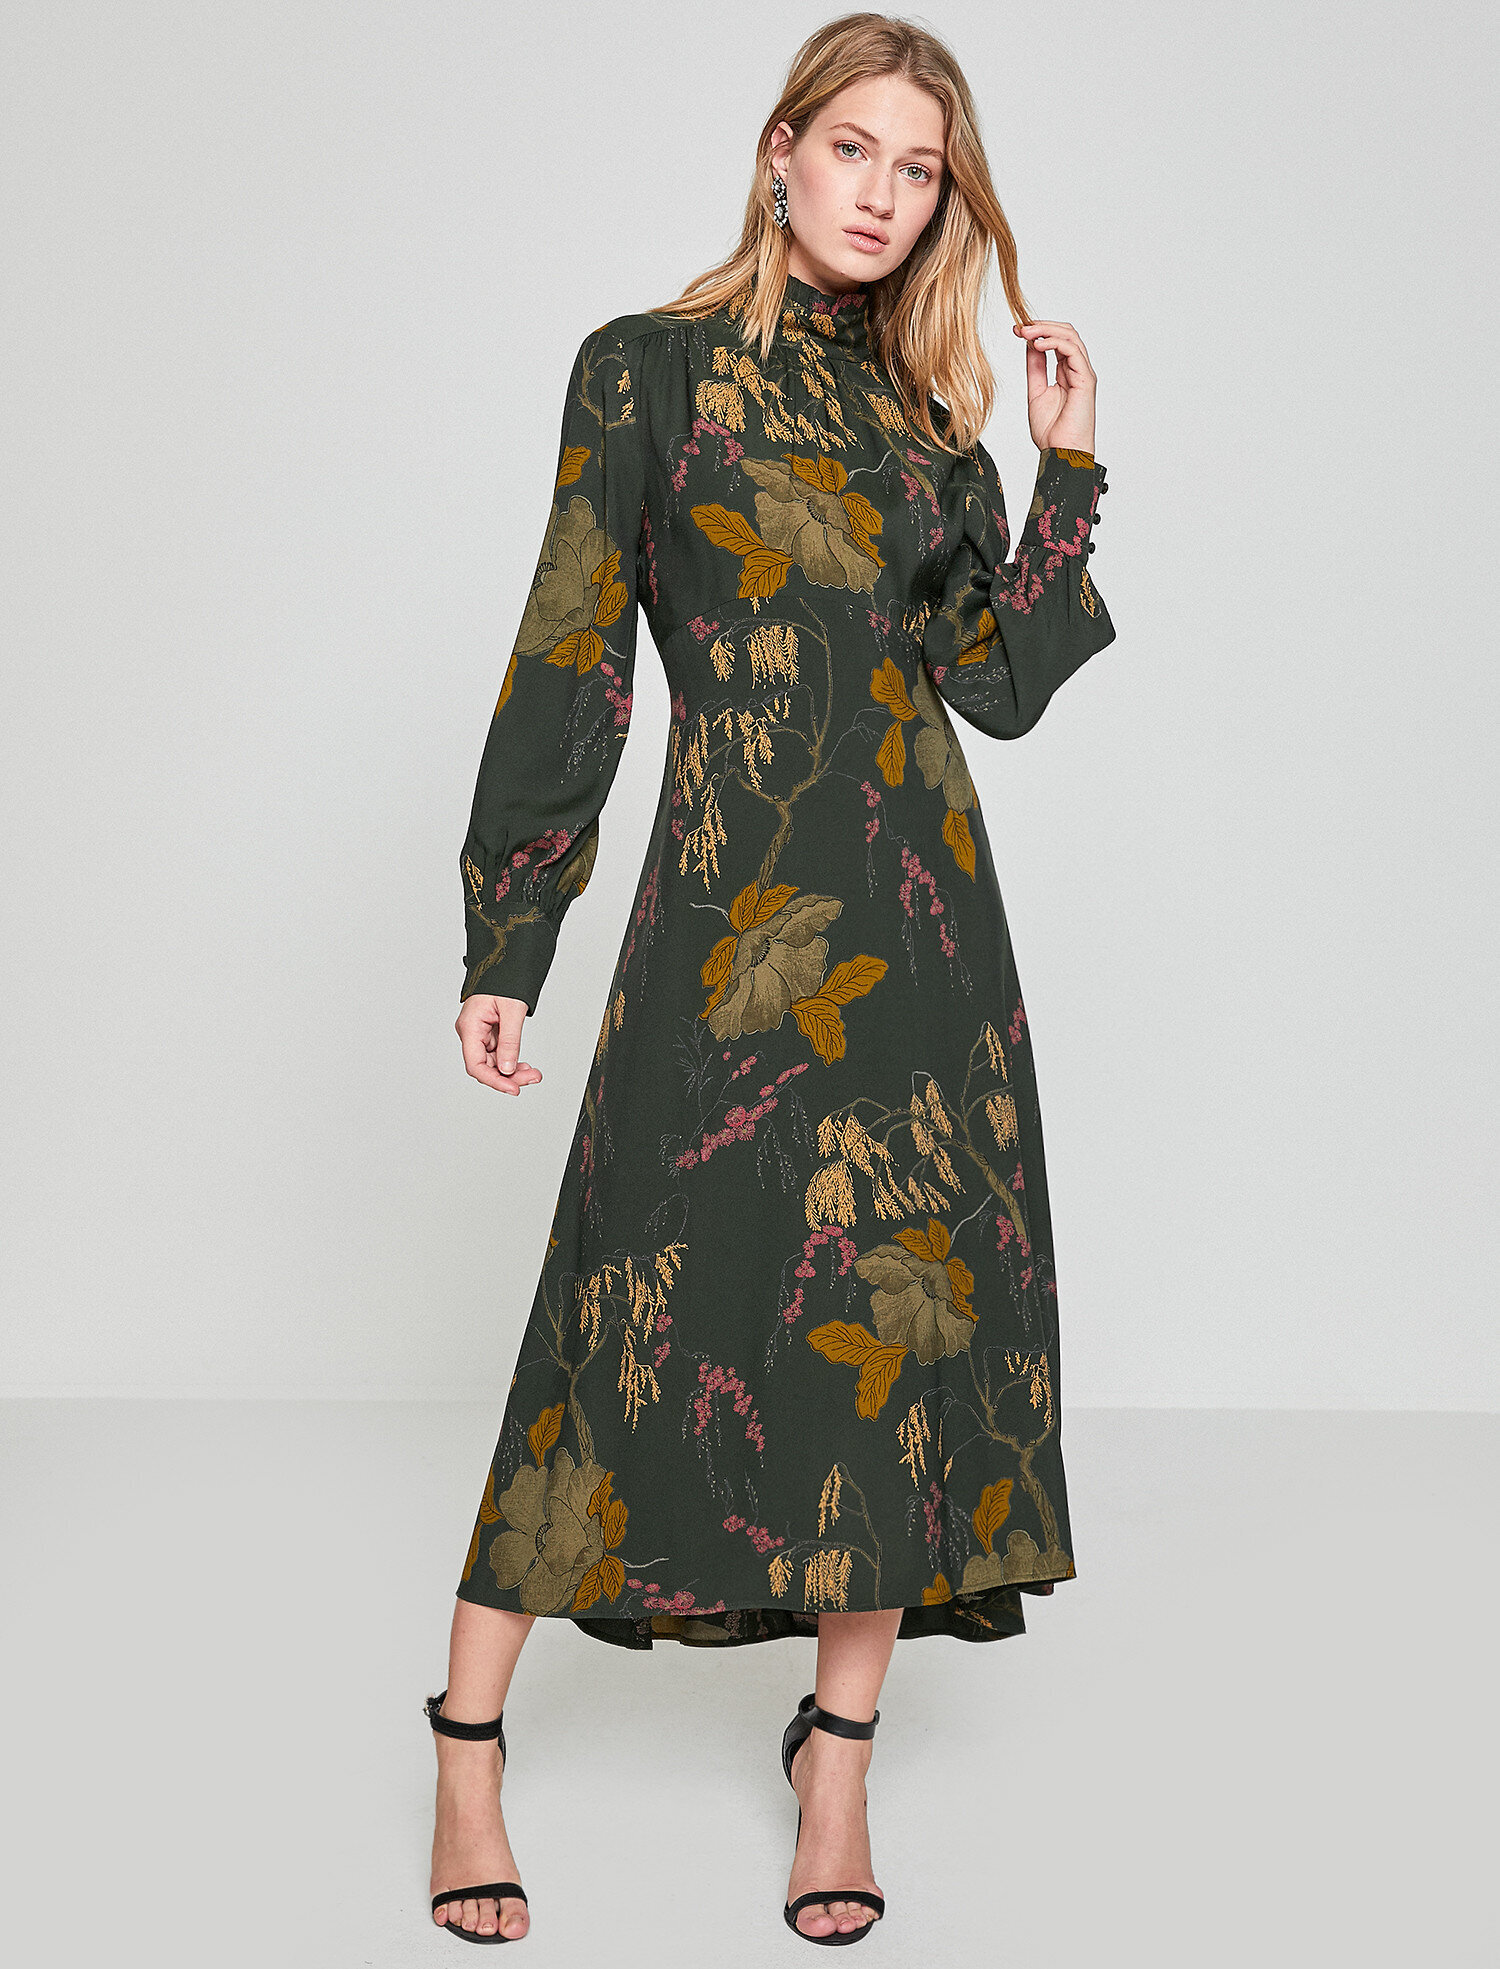 6bfbcfeb985cb Yeşil Bayan Desenli Elbise 8KAF80323OWE30 | Koton